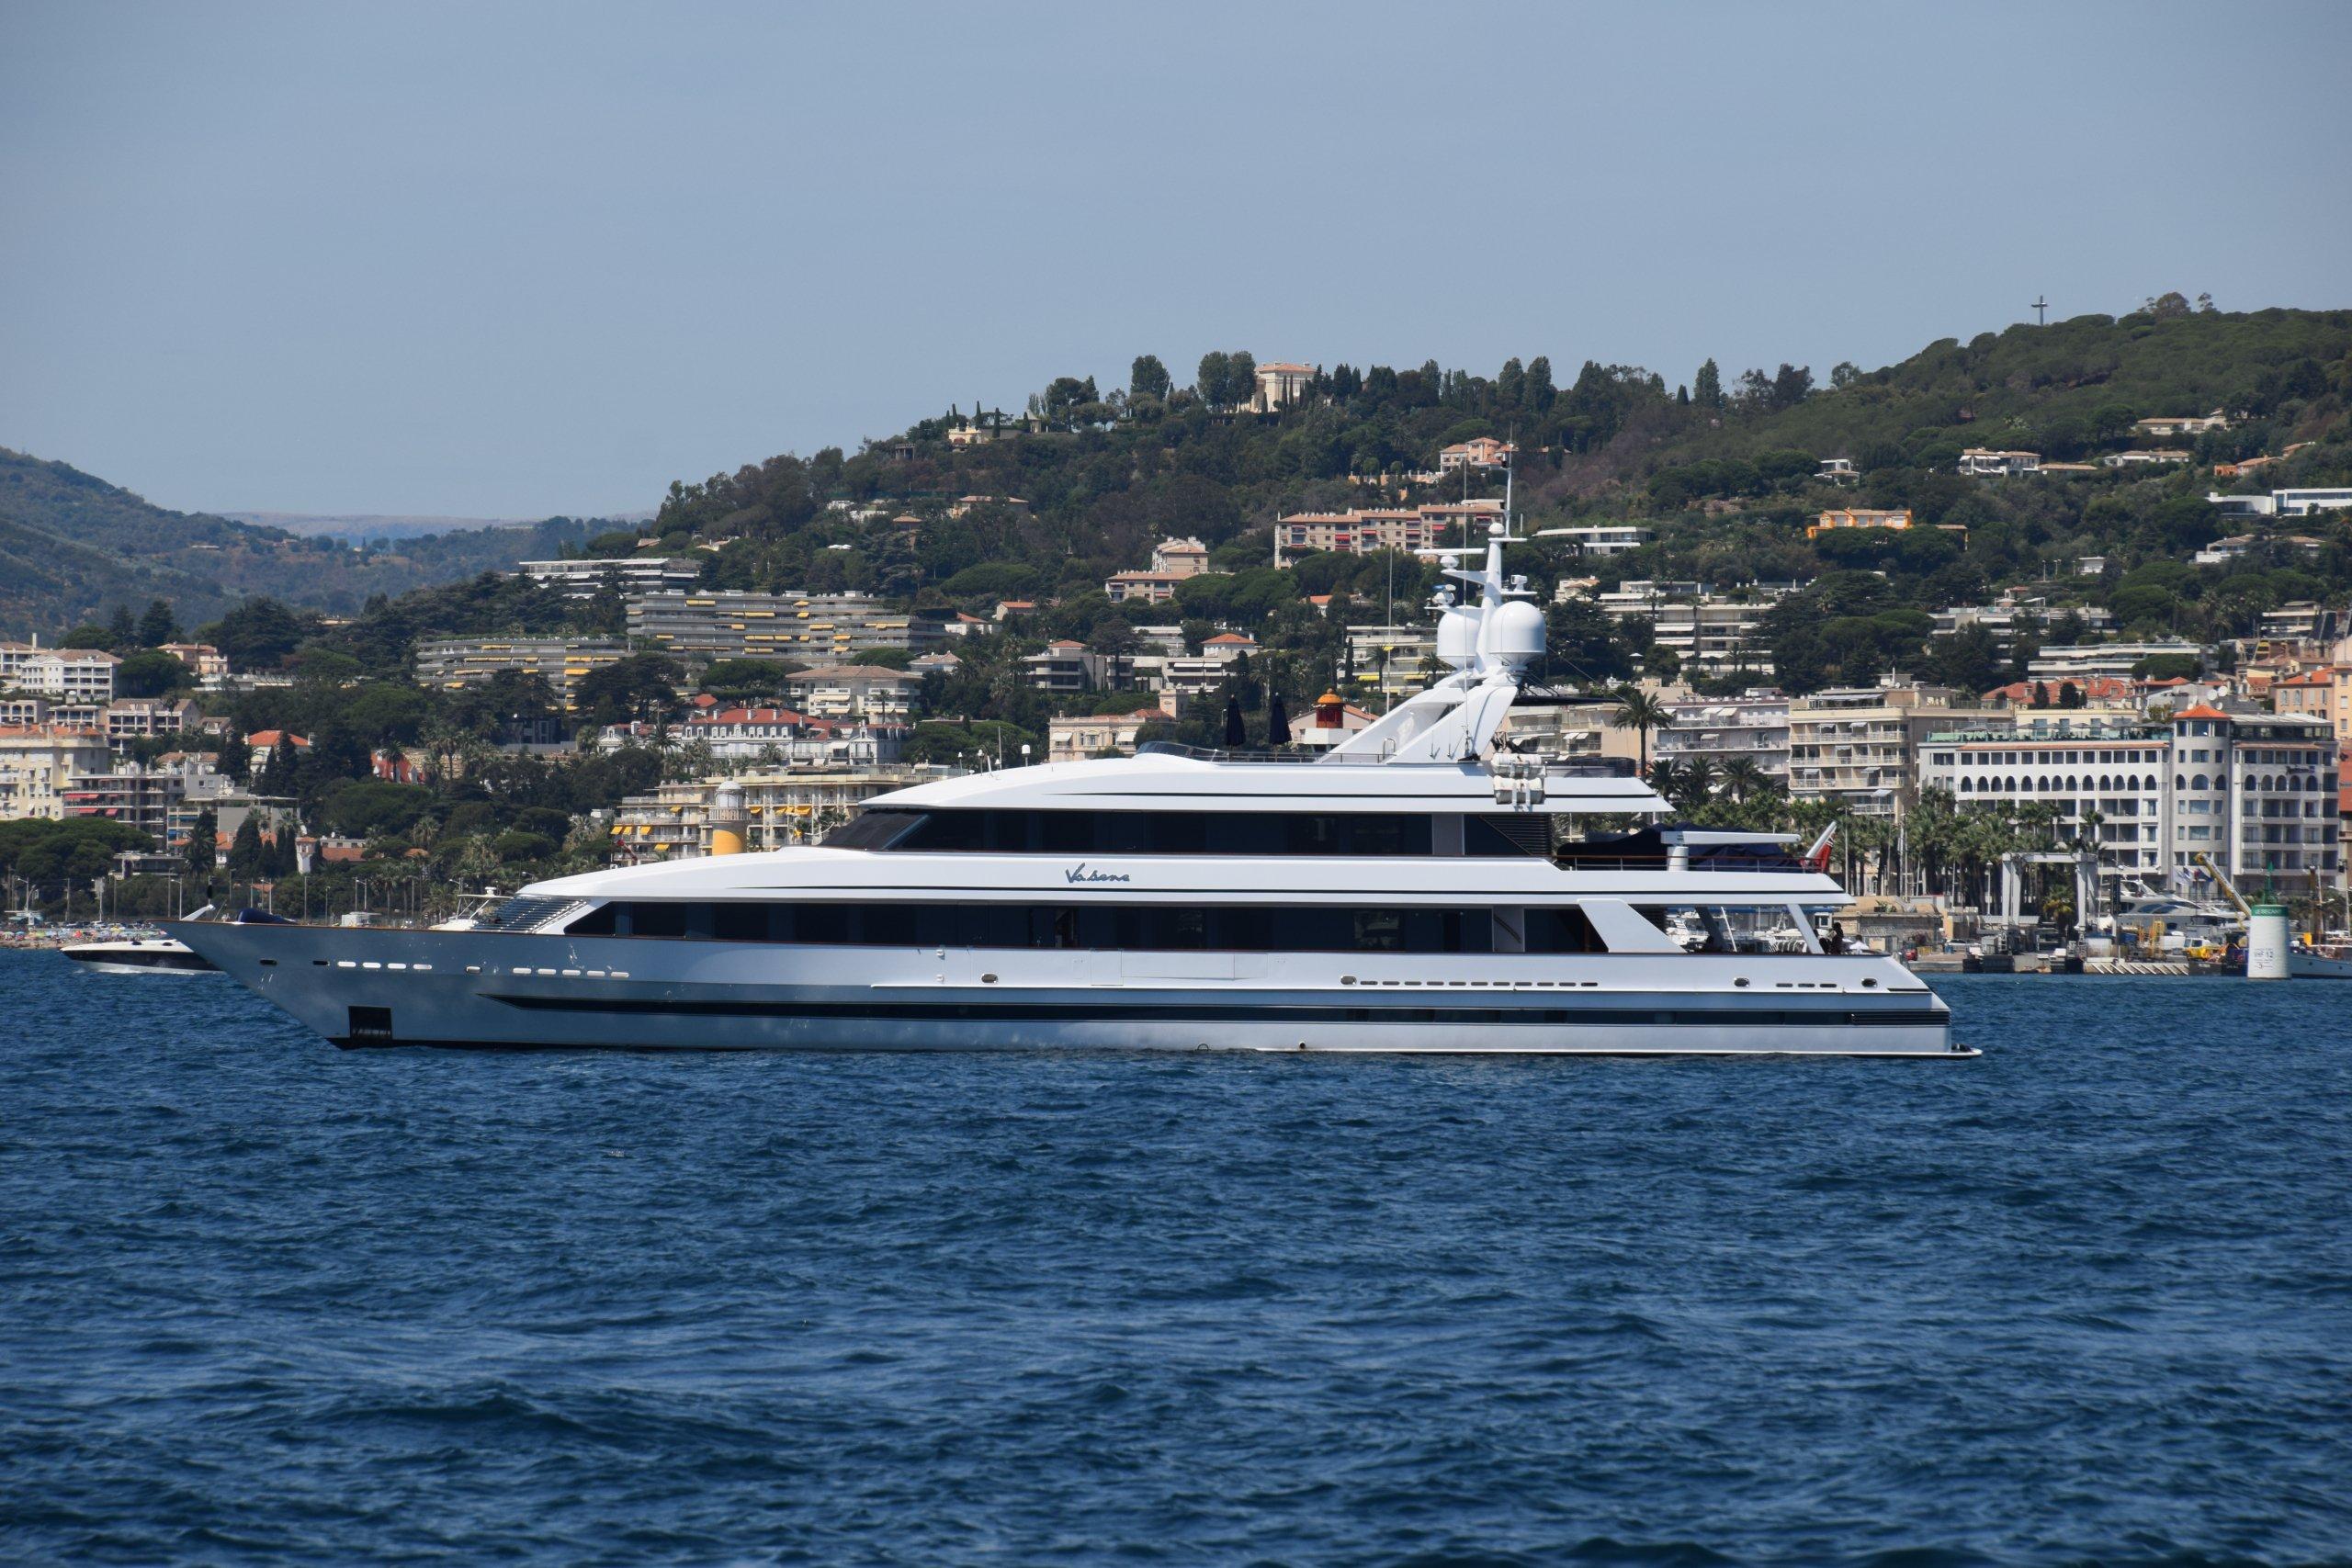 yacht Va Bene